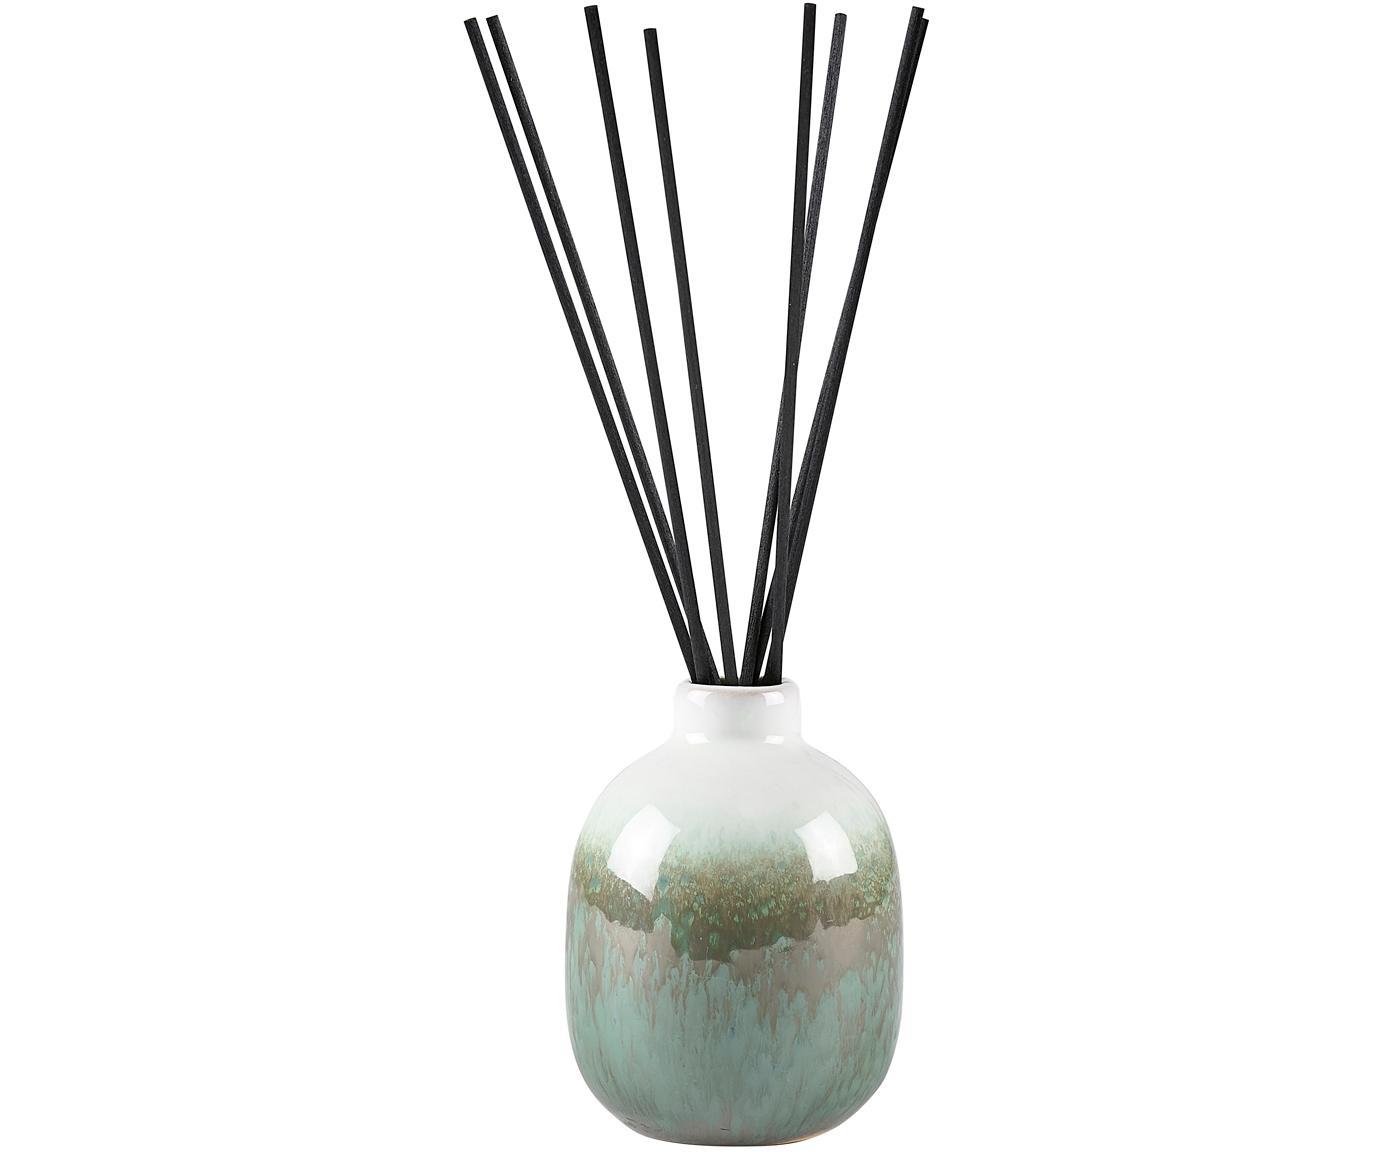 Diffusore Cactus Blossom, Contenitore: ceramica, Verde, beige, bianco, Ø 7 x Alt. 10 cm